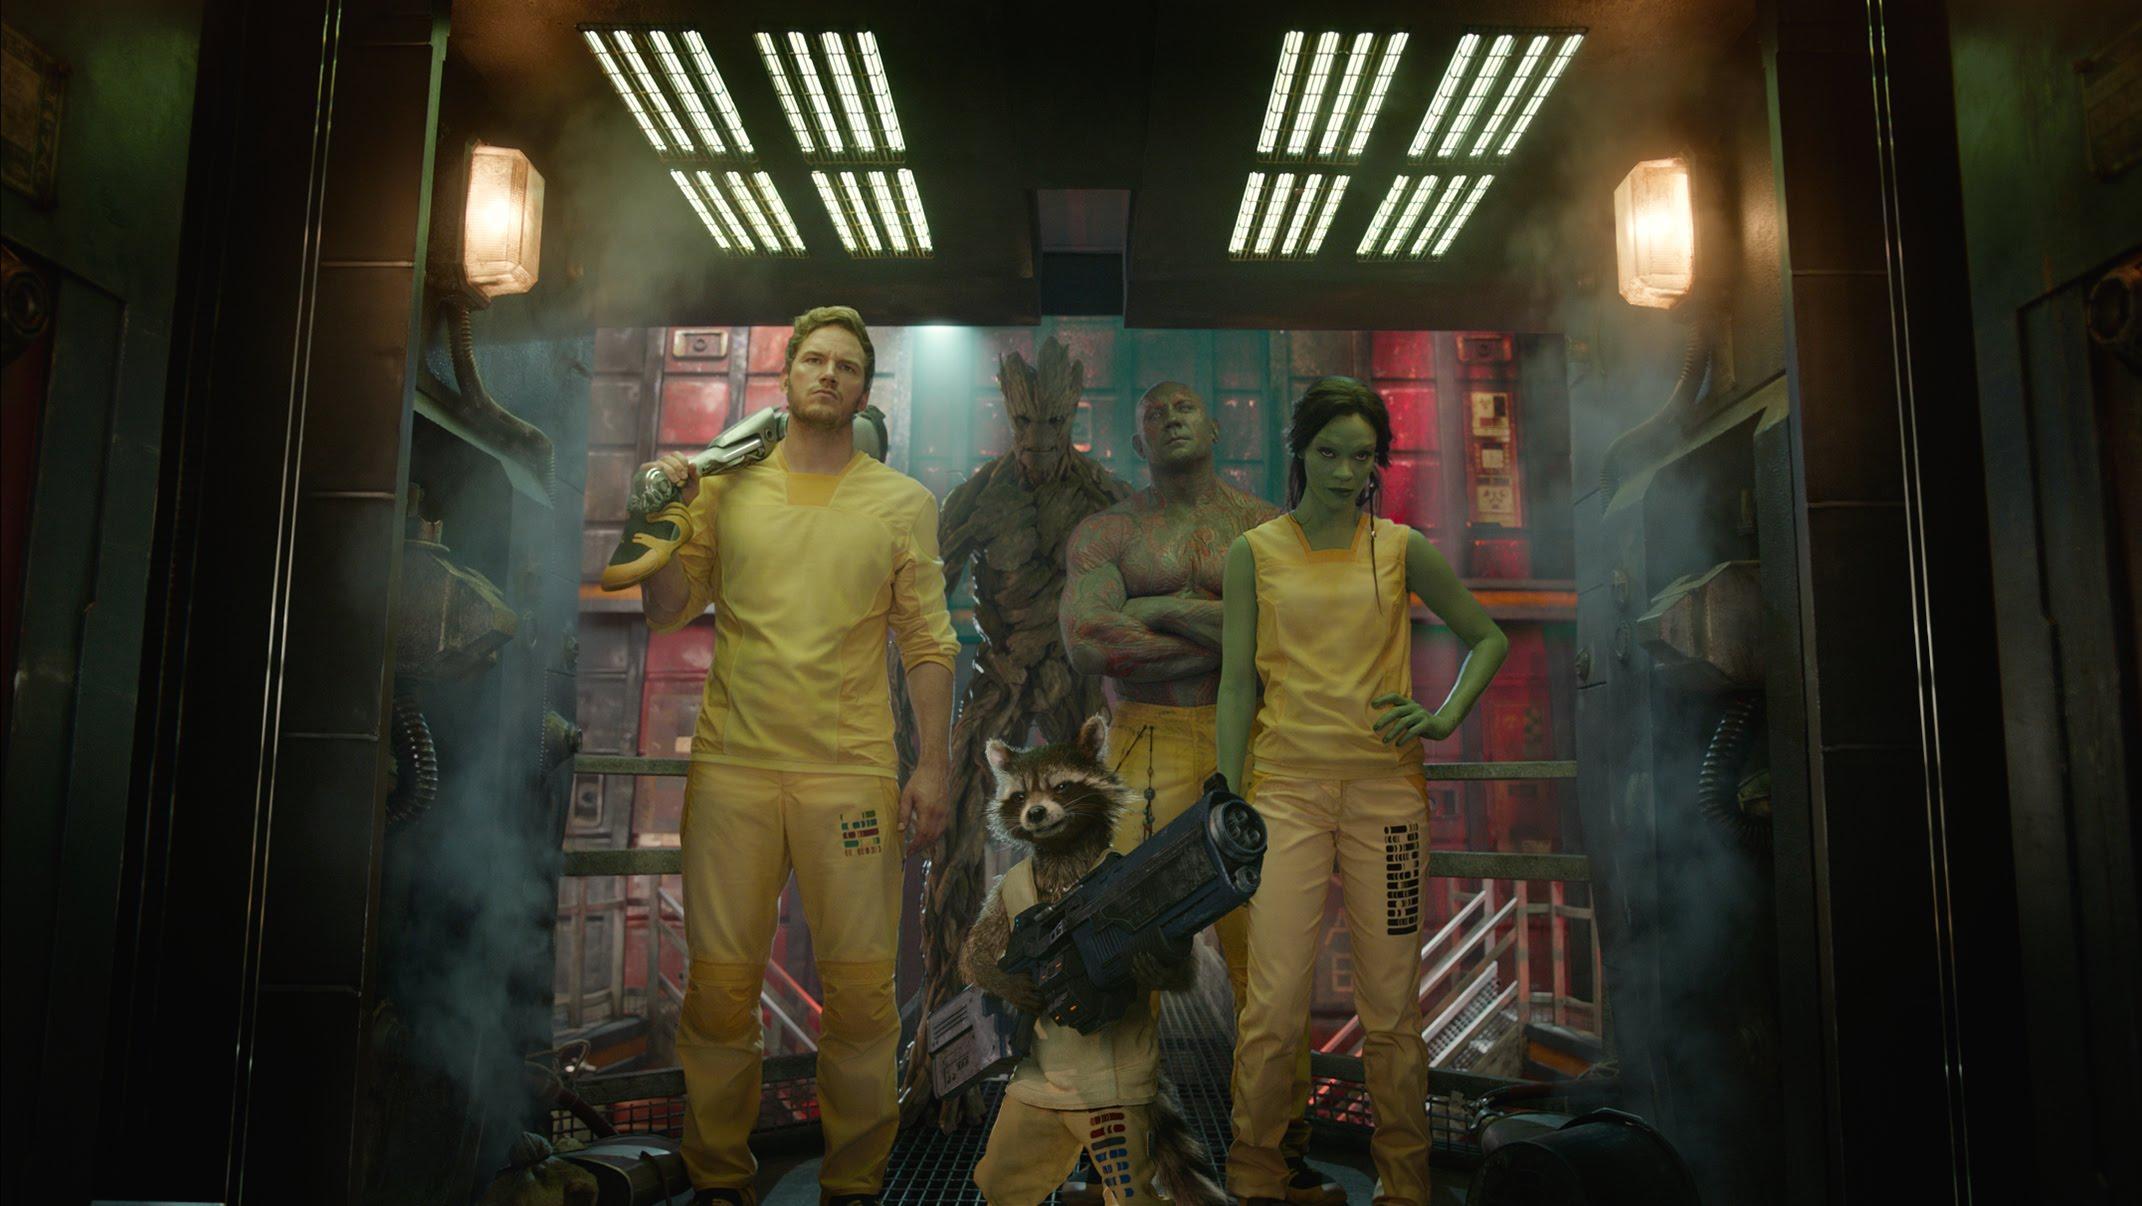 maxresdefault5FPDX5WR Japan hat echt die besten Trailer zu Guardians of the Galaxy